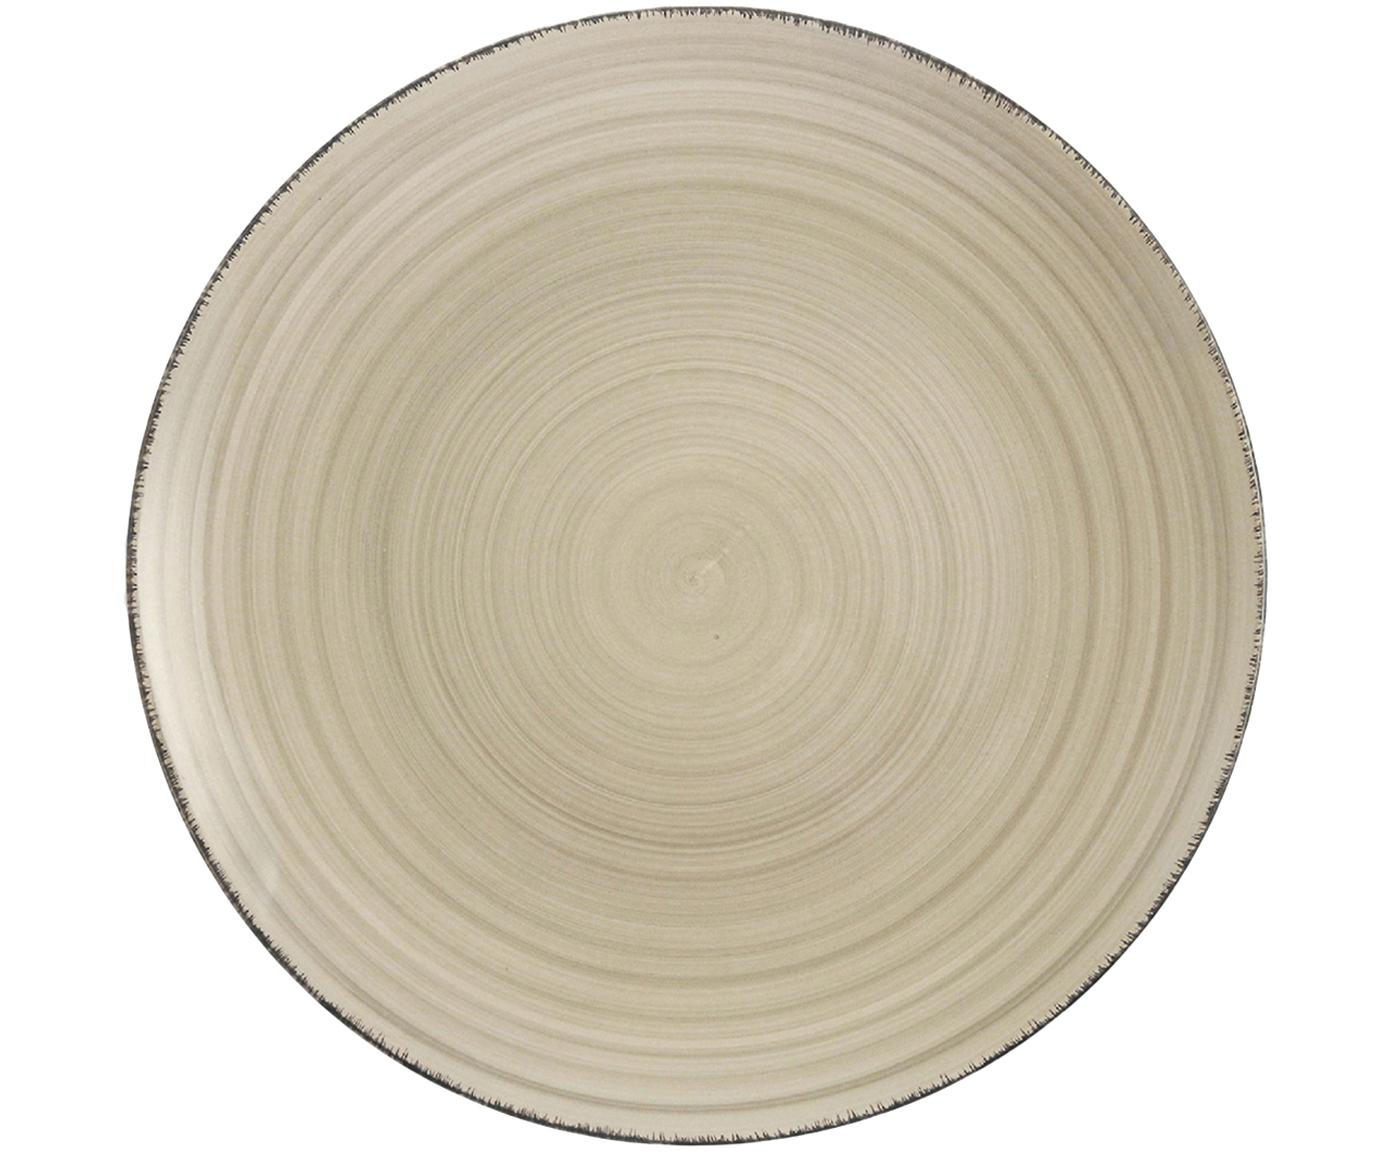 Dinerbord Baita, 6 stuks, Handbeschilderde keramiek (hard dolomiet), Grijs, Ø 27 cm